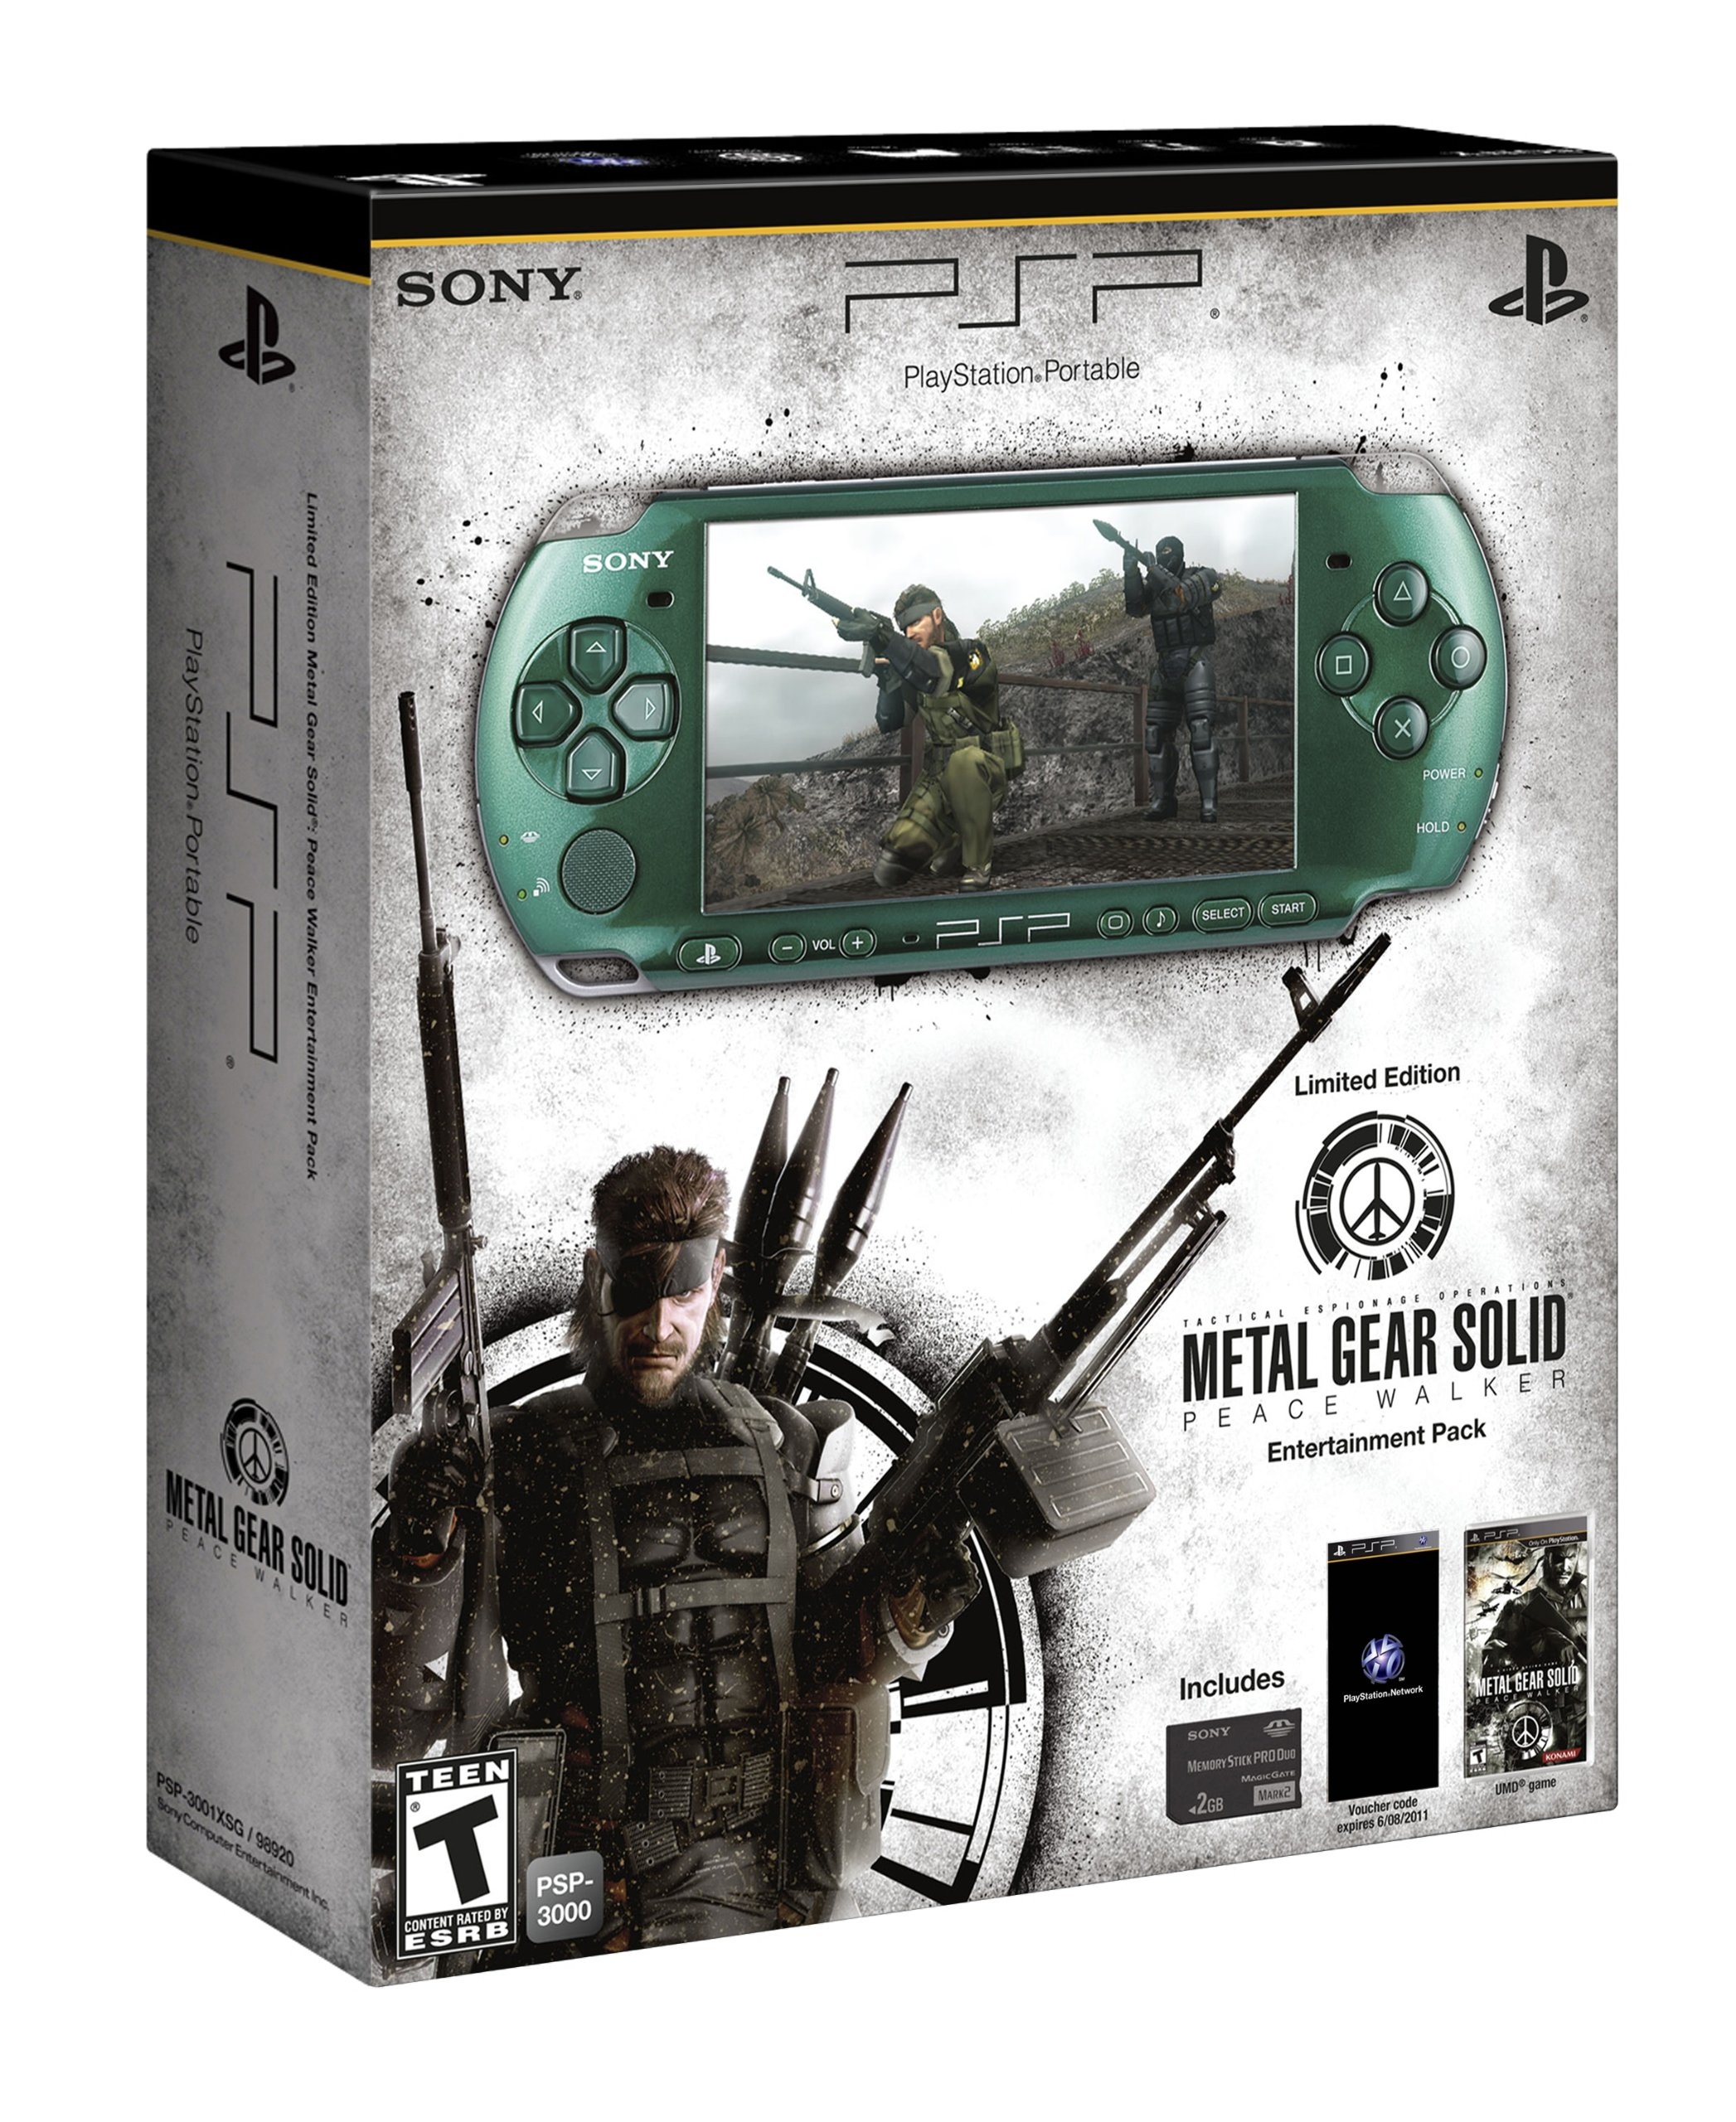 Sony PSP Metal Gear Solid Entertainment Pack - juegos de PC (AVCHD, H.264, MPEG4, MP3, PCM, JPG, PSP CPU, MS Duo, 2 GB) Verde: Amazon.es: Videojuegos